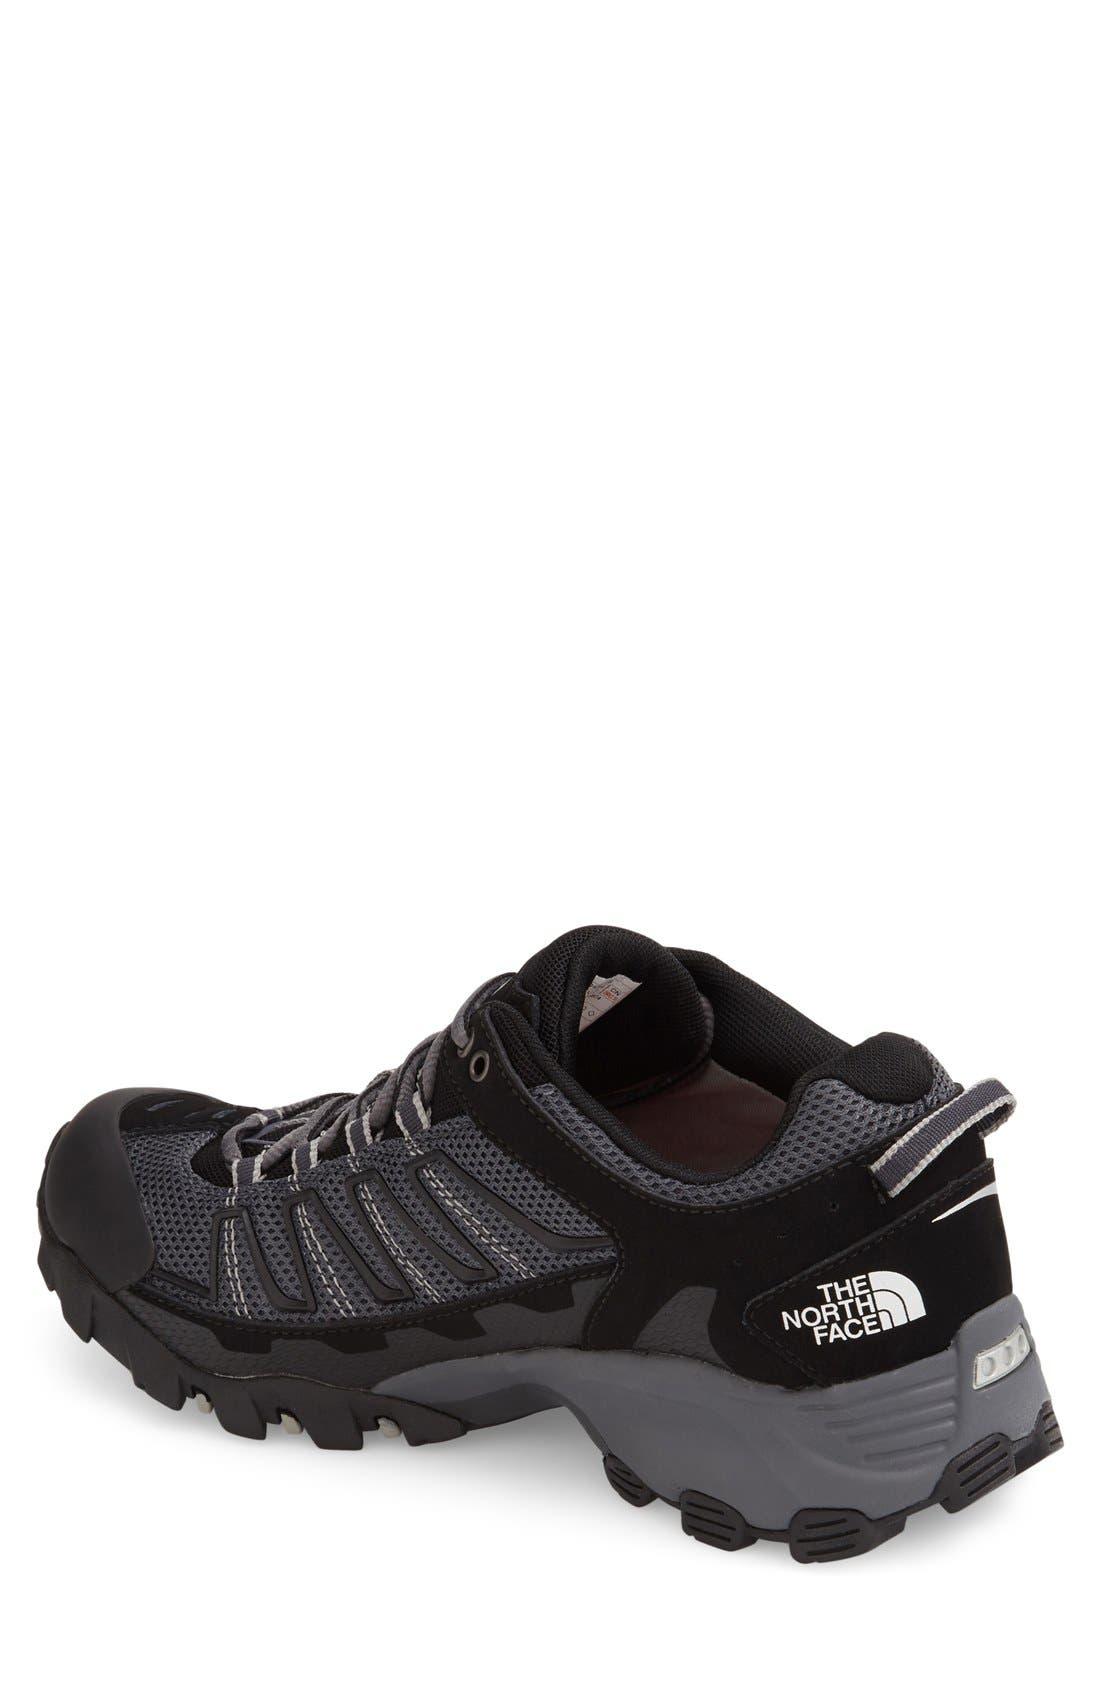 'Ultra 109 GTX' Waterproof Running Shoe,                             Alternate thumbnail 2, color,                             Black/ Dark Shadow Grey